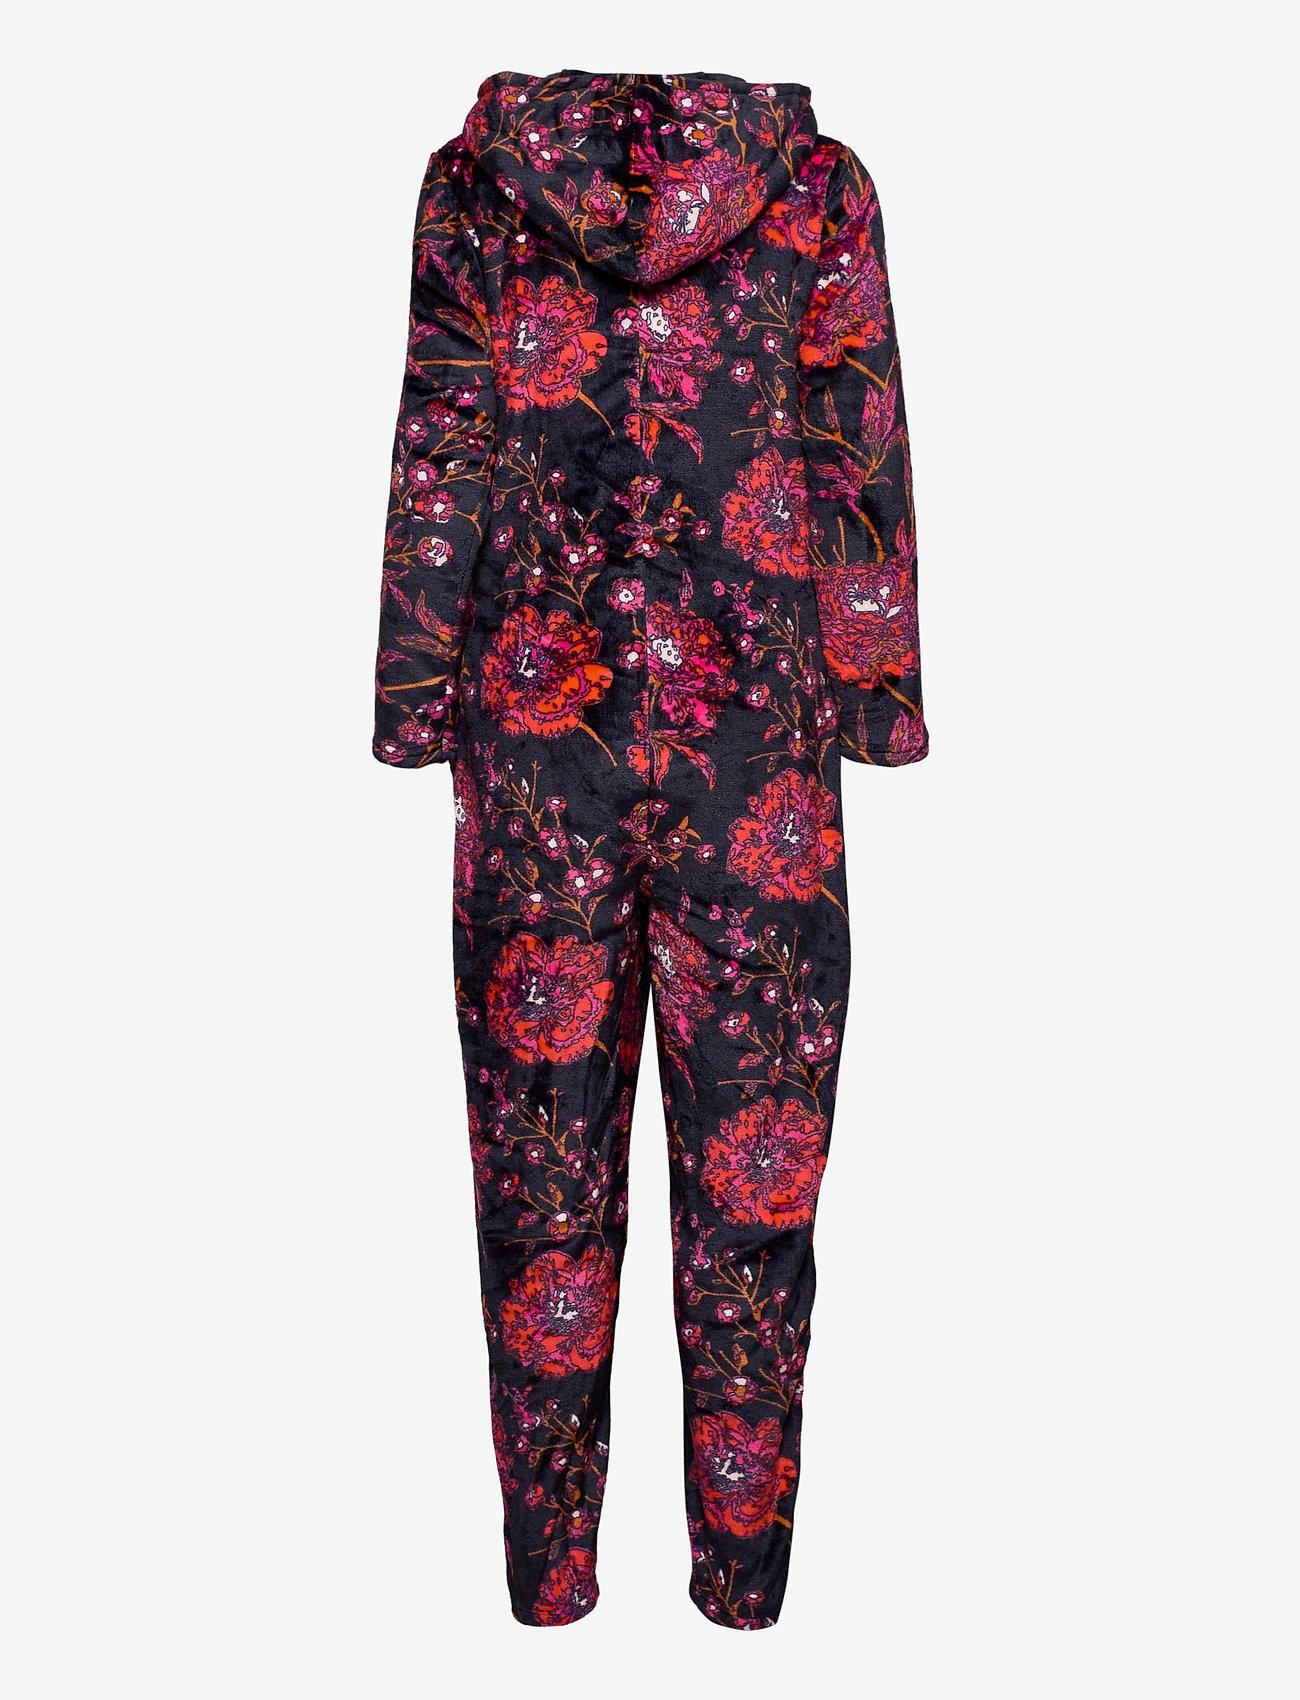 Decoy - DECOY onepiece w/hood, zipper - pyjama''s - flerfärgad - 1